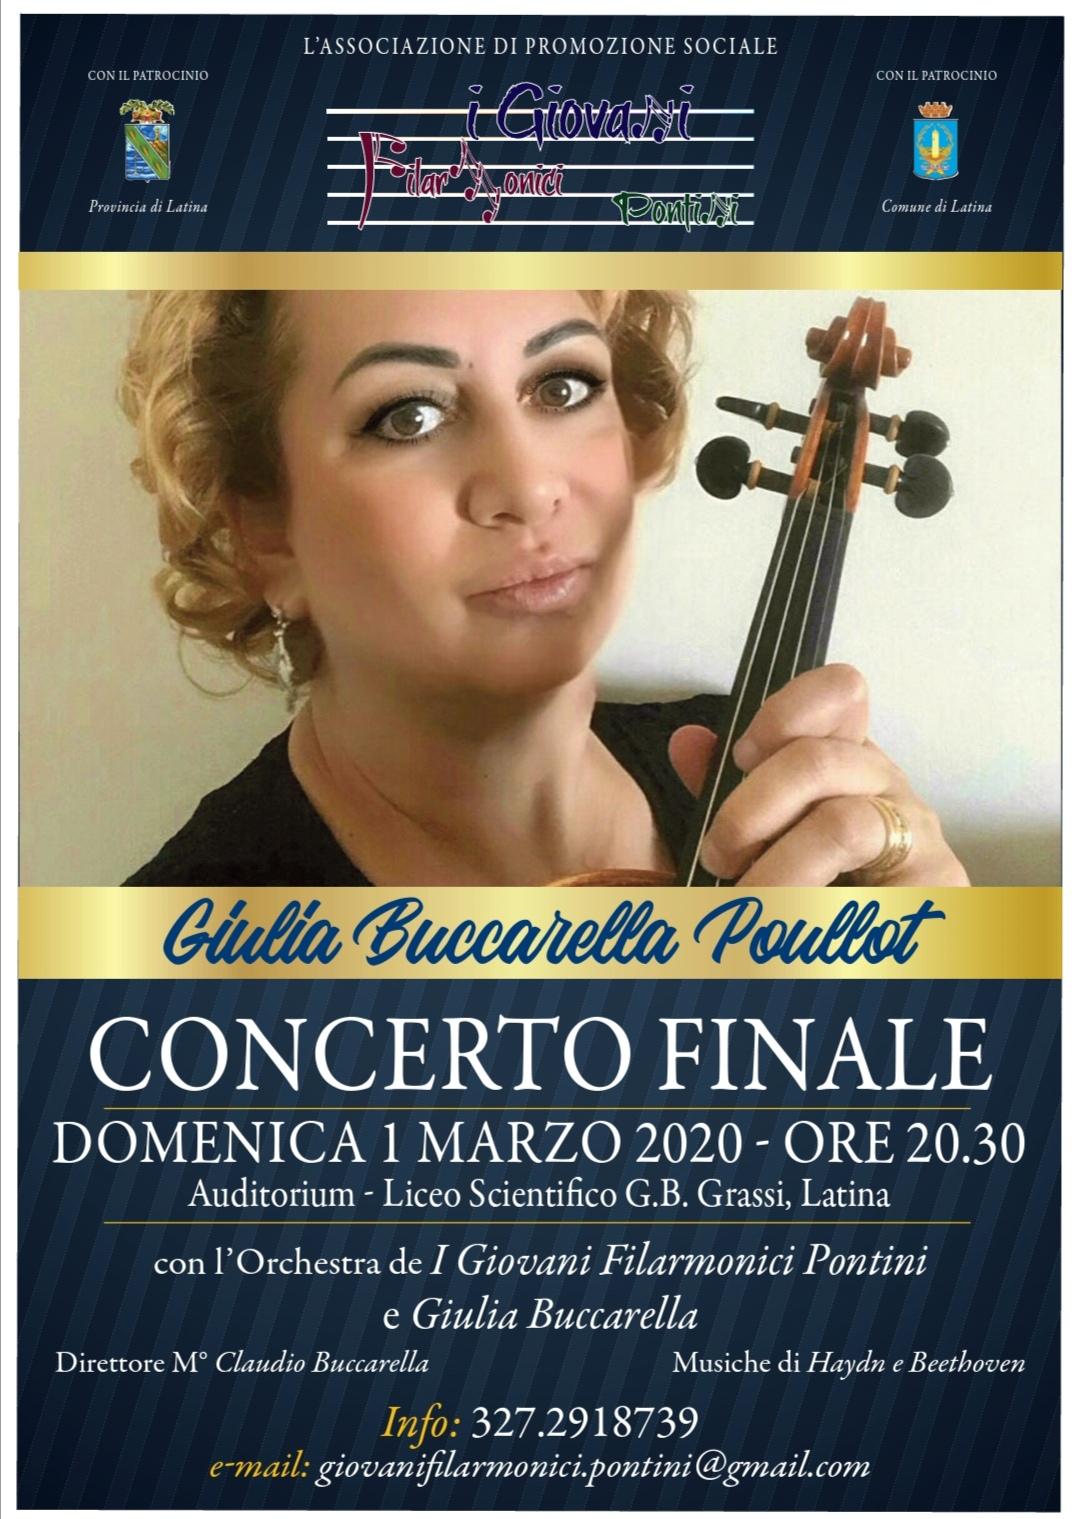 Giulia Buccarella Poullot in Concerto aLatina